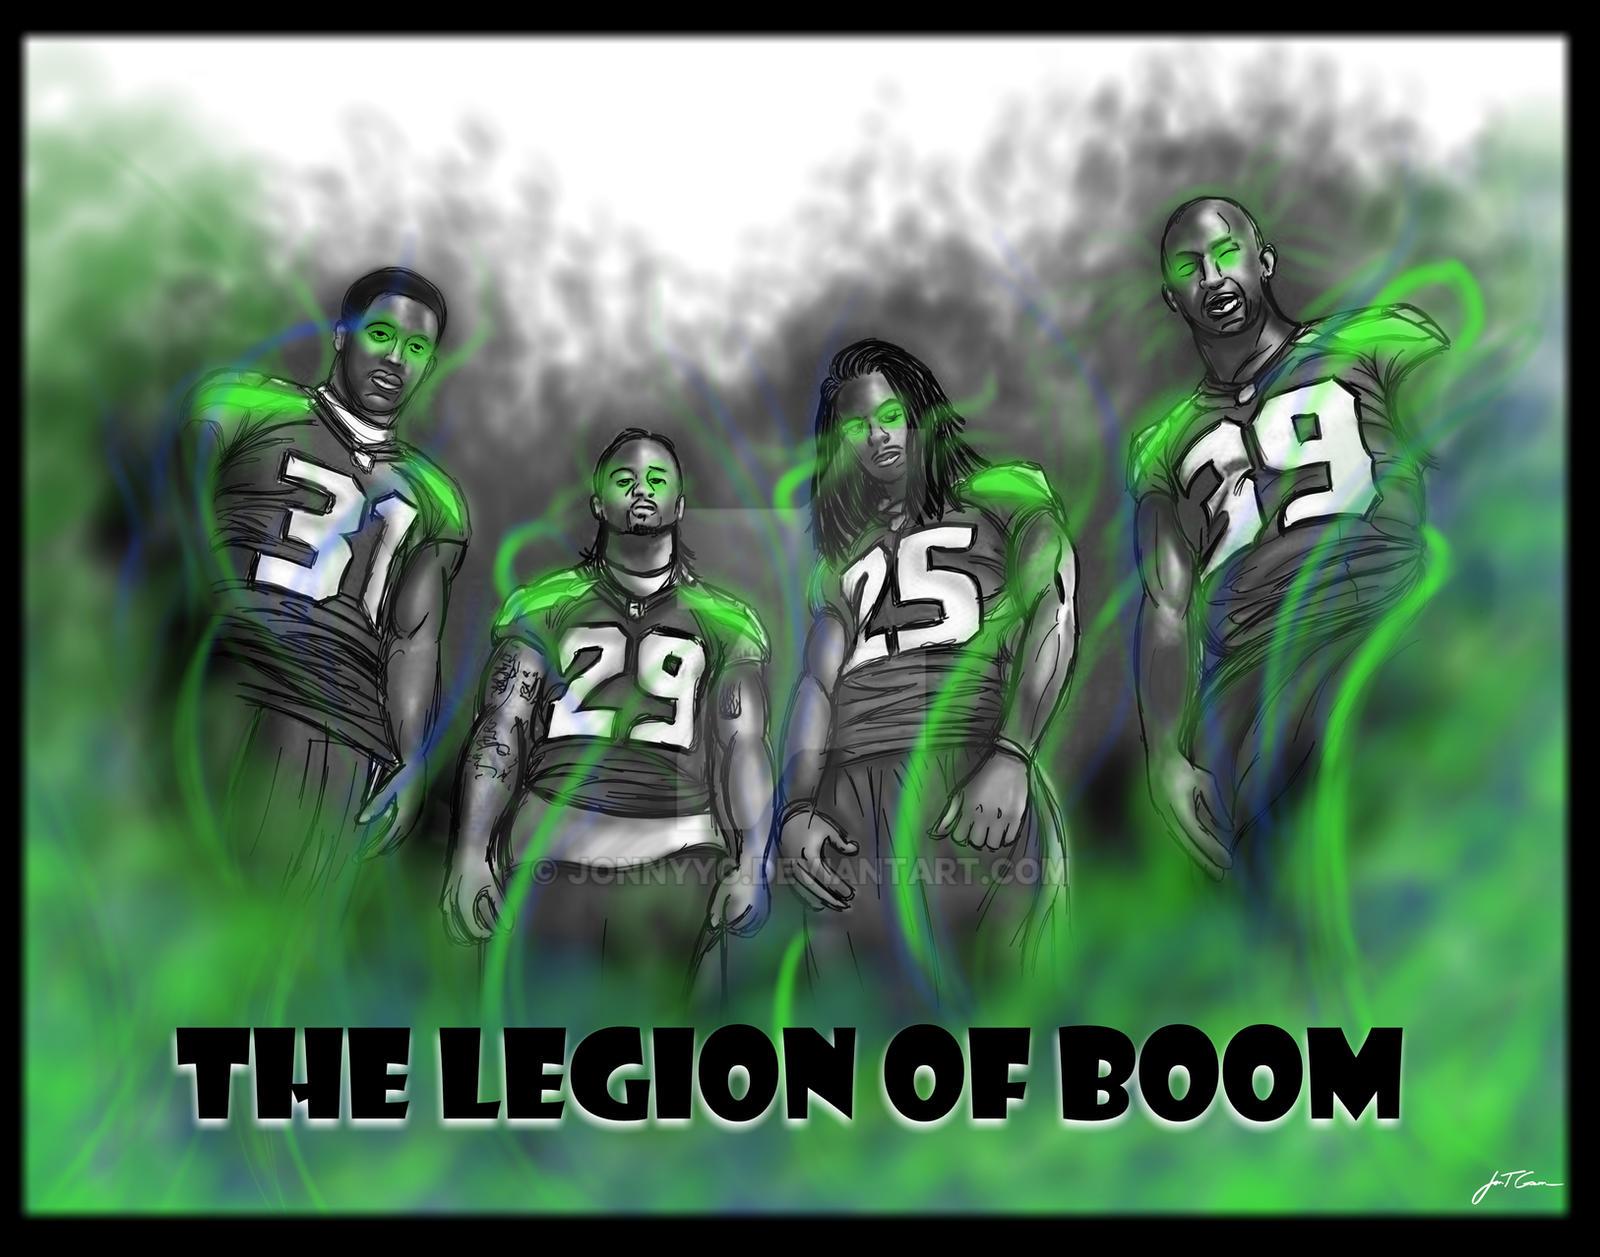 legion of boom 2017 - photo #8